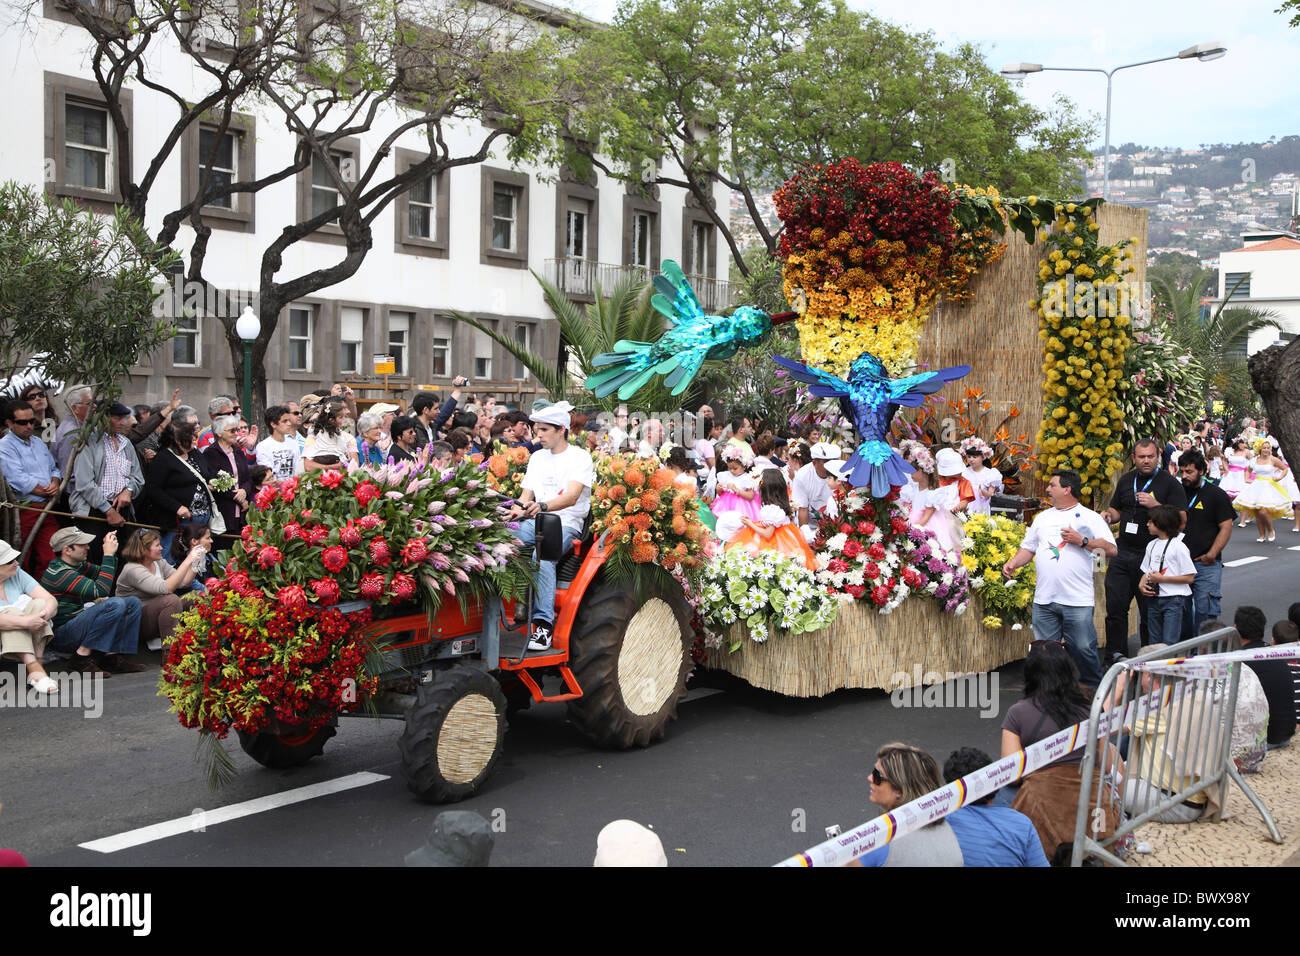 Portugal Madeira Funchal Festa da Flor Flower Festival Procession - Stock Image